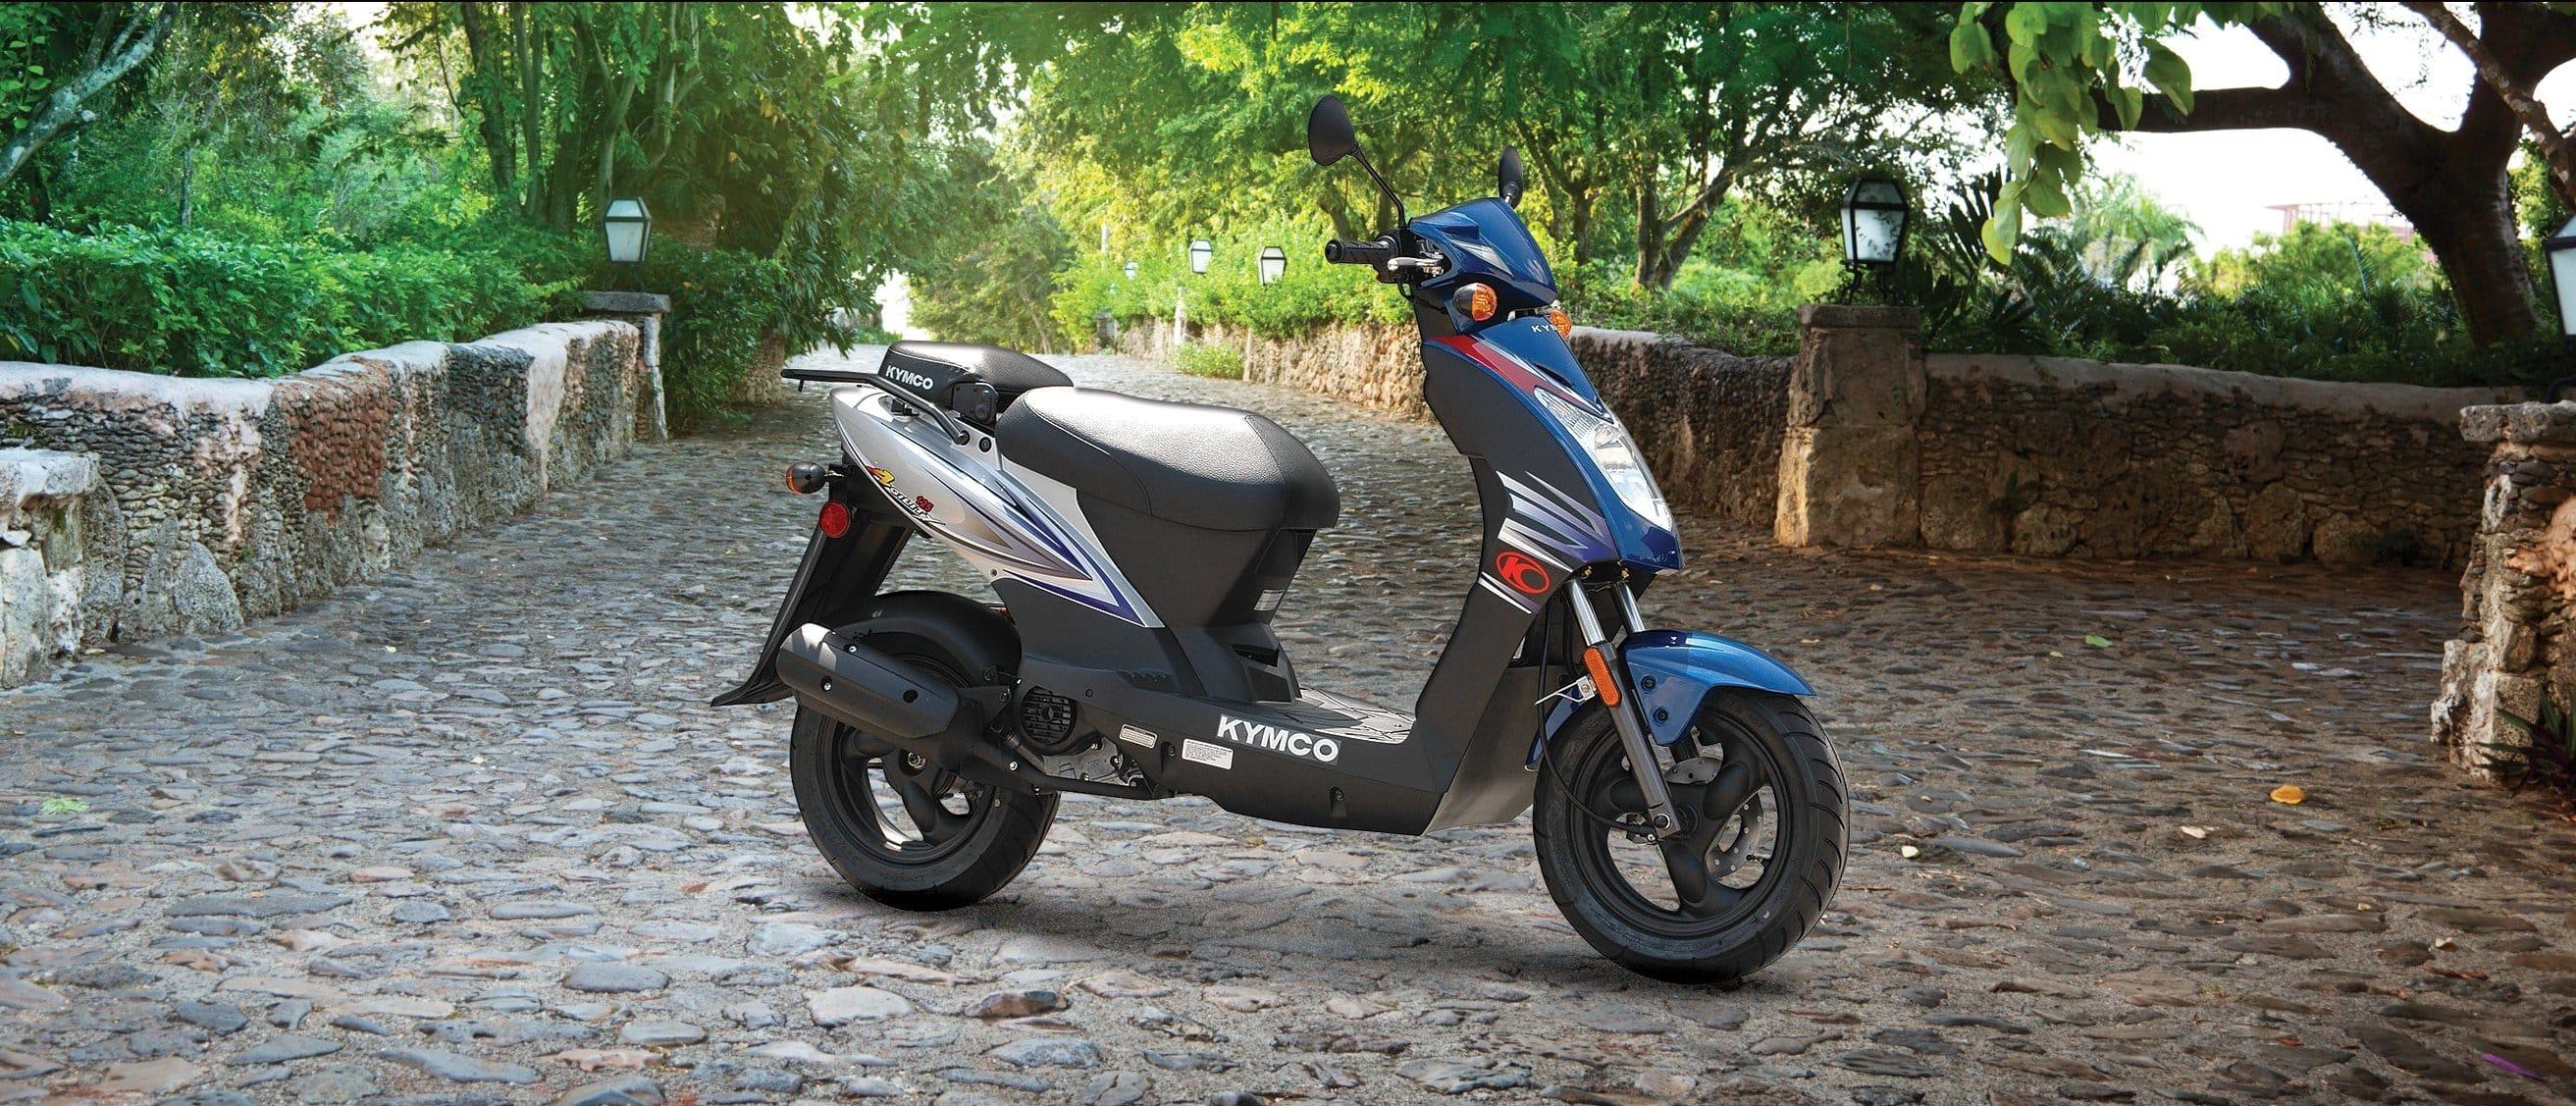 Siesta key scooter, siesta key scooters, siesta key scooter rentals, siesta key scooter rental, siesta key motor rental